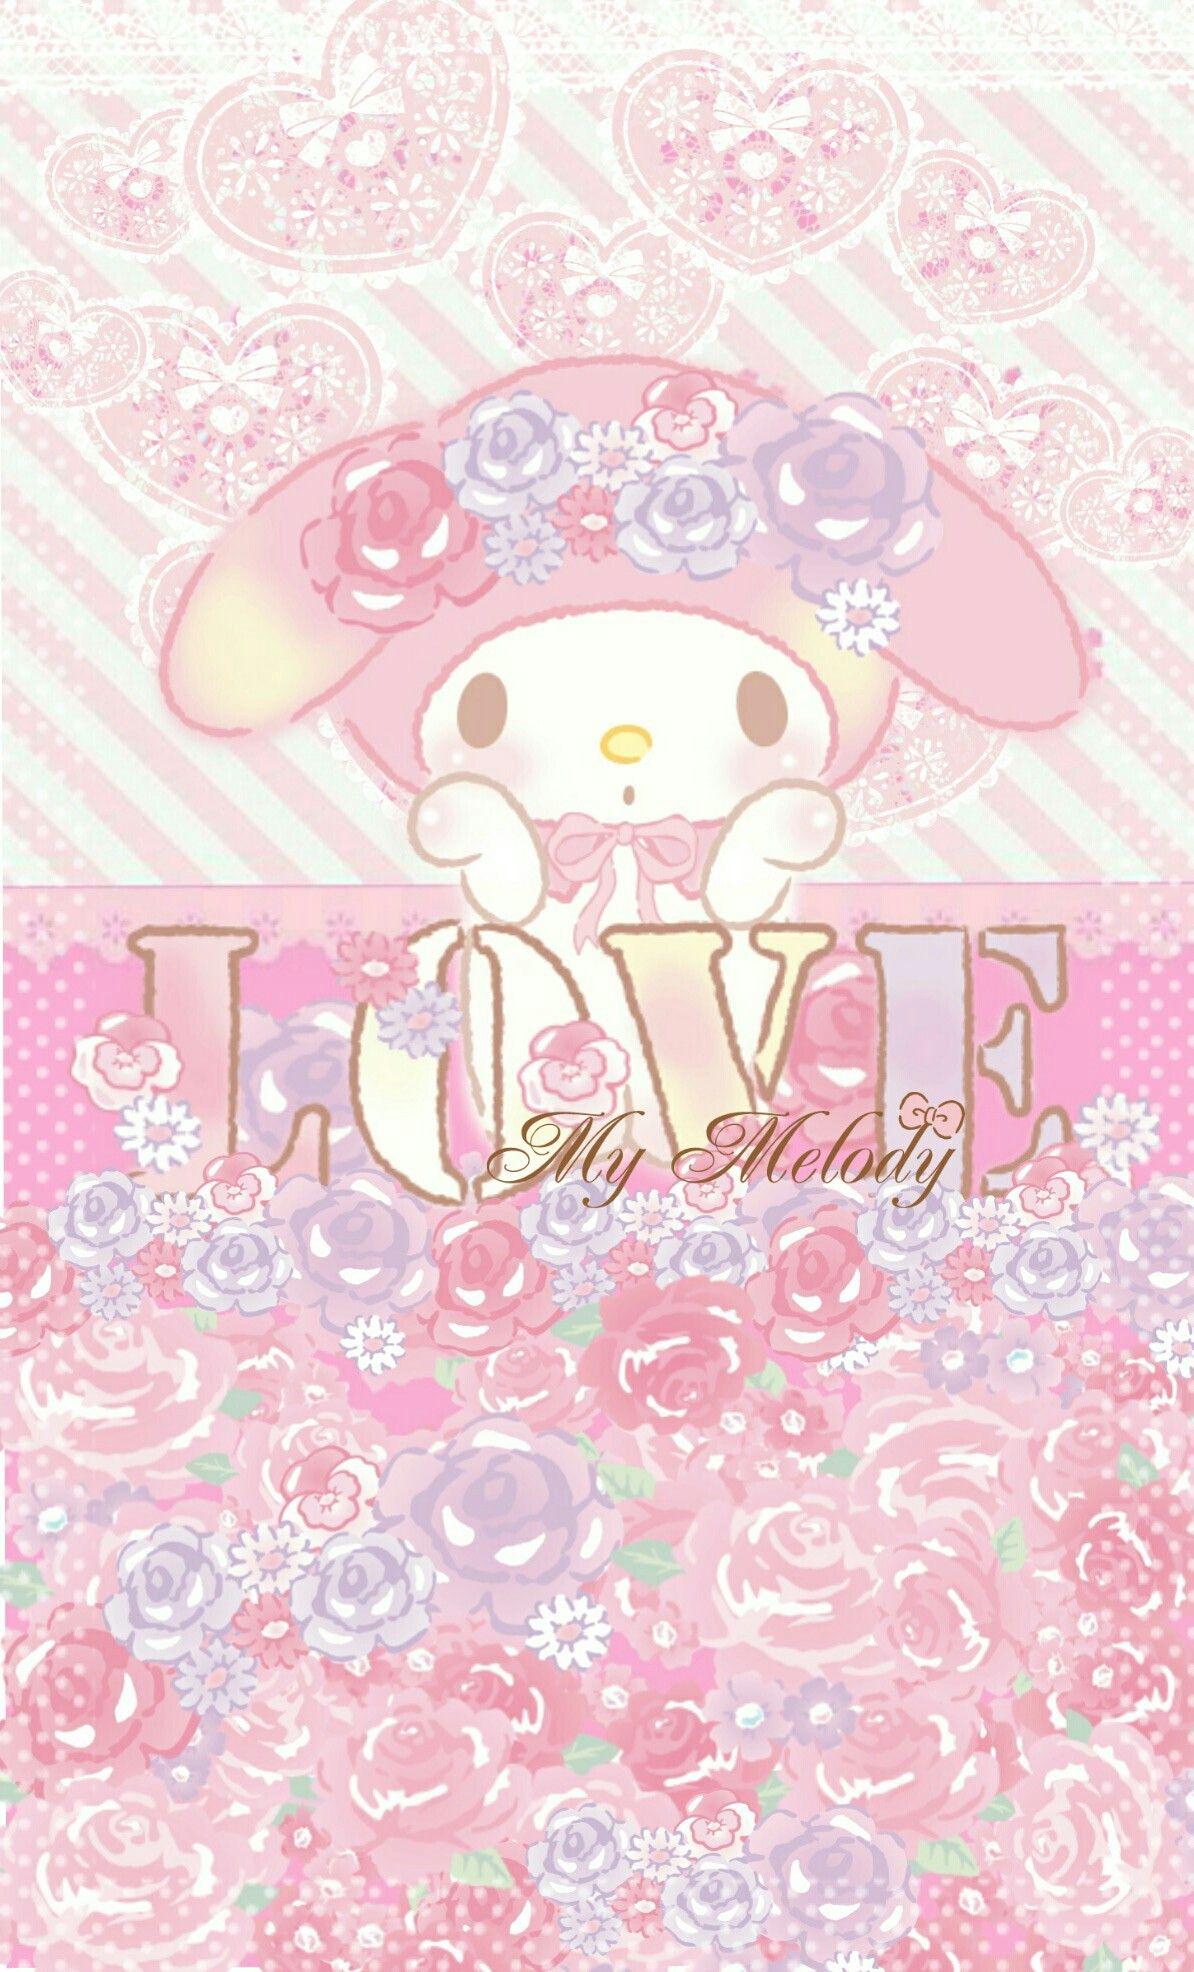 Most Inspiring Wallpaper Hello Kitty Sakura - 87af79f6c806ac81aa79d5dbfc79227b  Image_604444.jpg